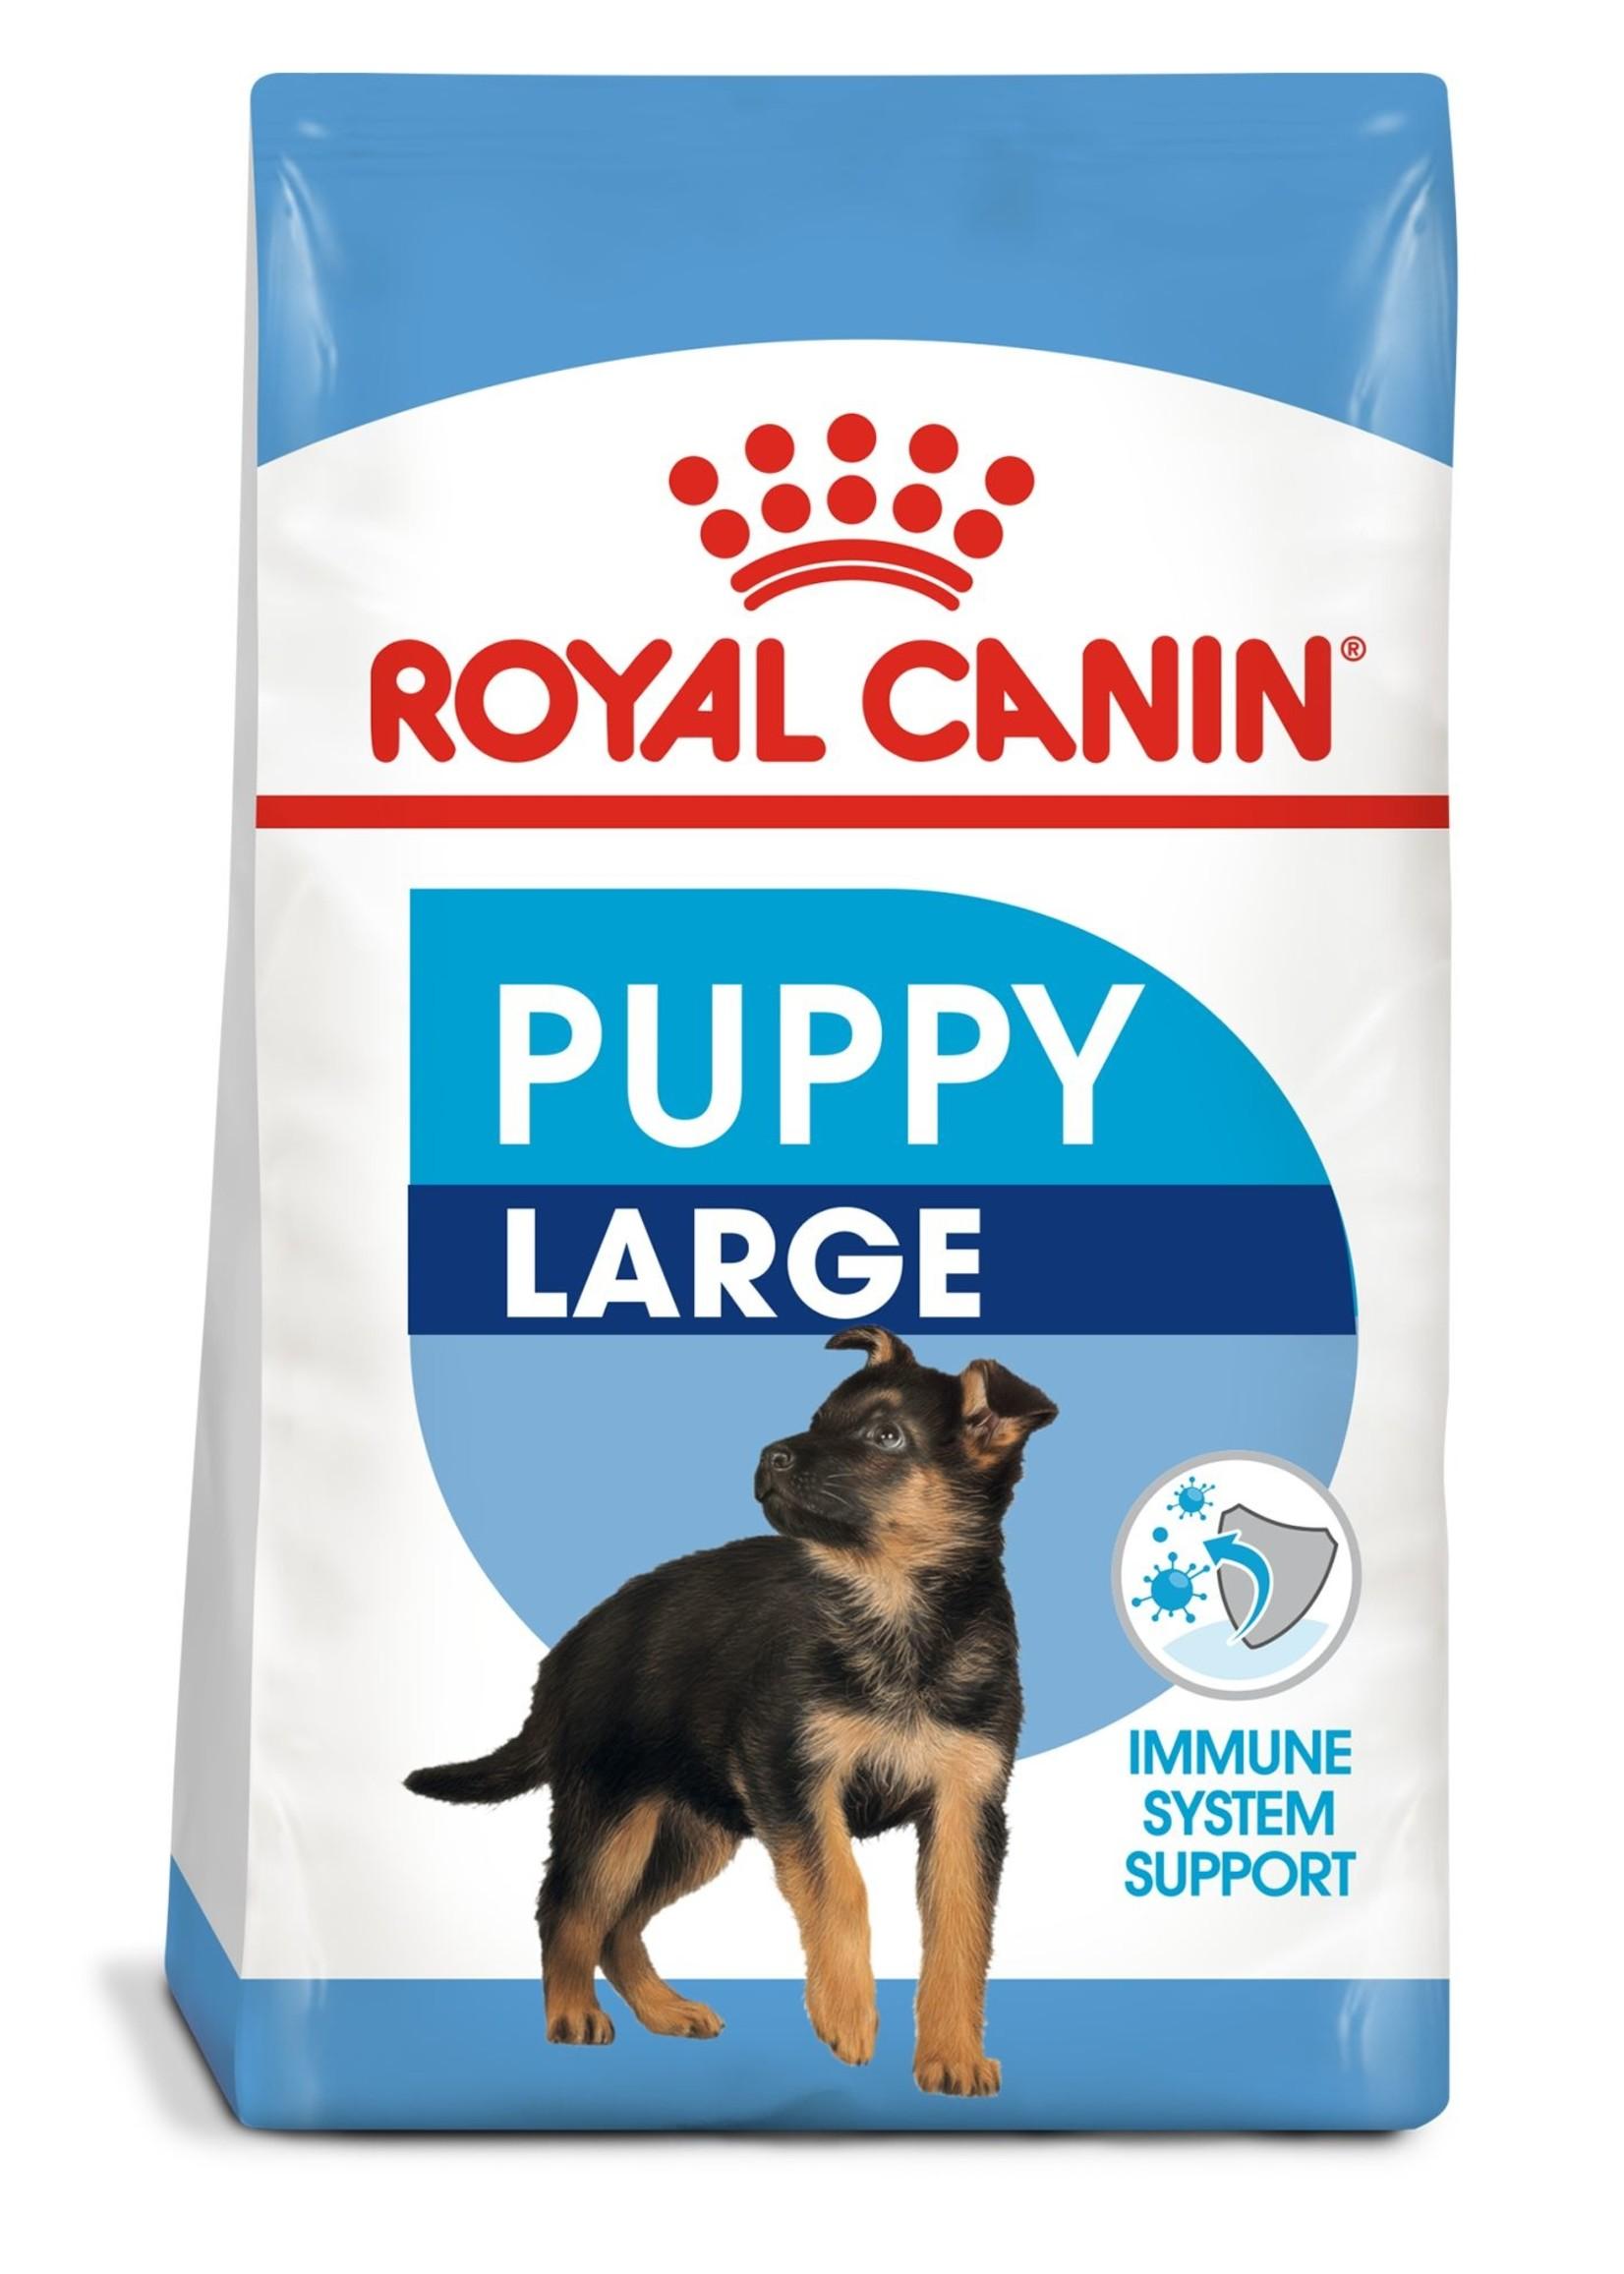 Royal Canin Royal Canin Dog Large Puppy 6lb